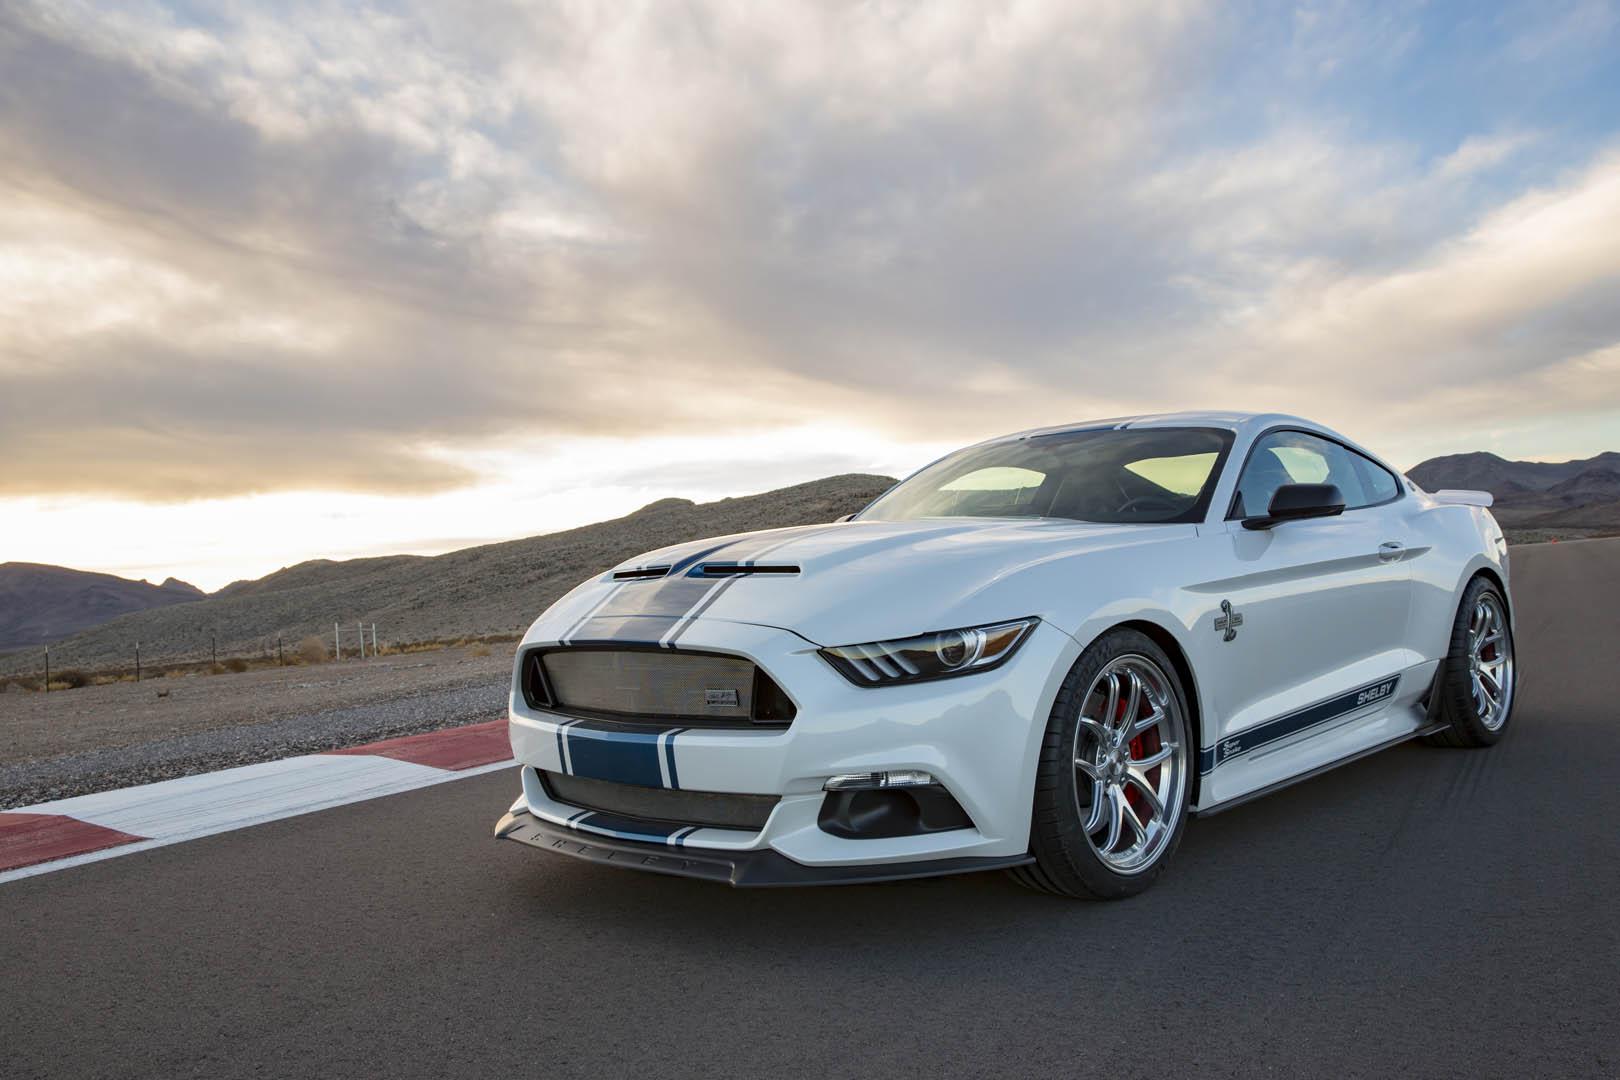 Super Snake For Sale >> New 2019 Ford Mustang Coupe 2019 Shelby Super Snake For Sale In Rochester Ny Near Henrietta Churchville Scottsville Ny Vin 1fa6p8cf9k5117611